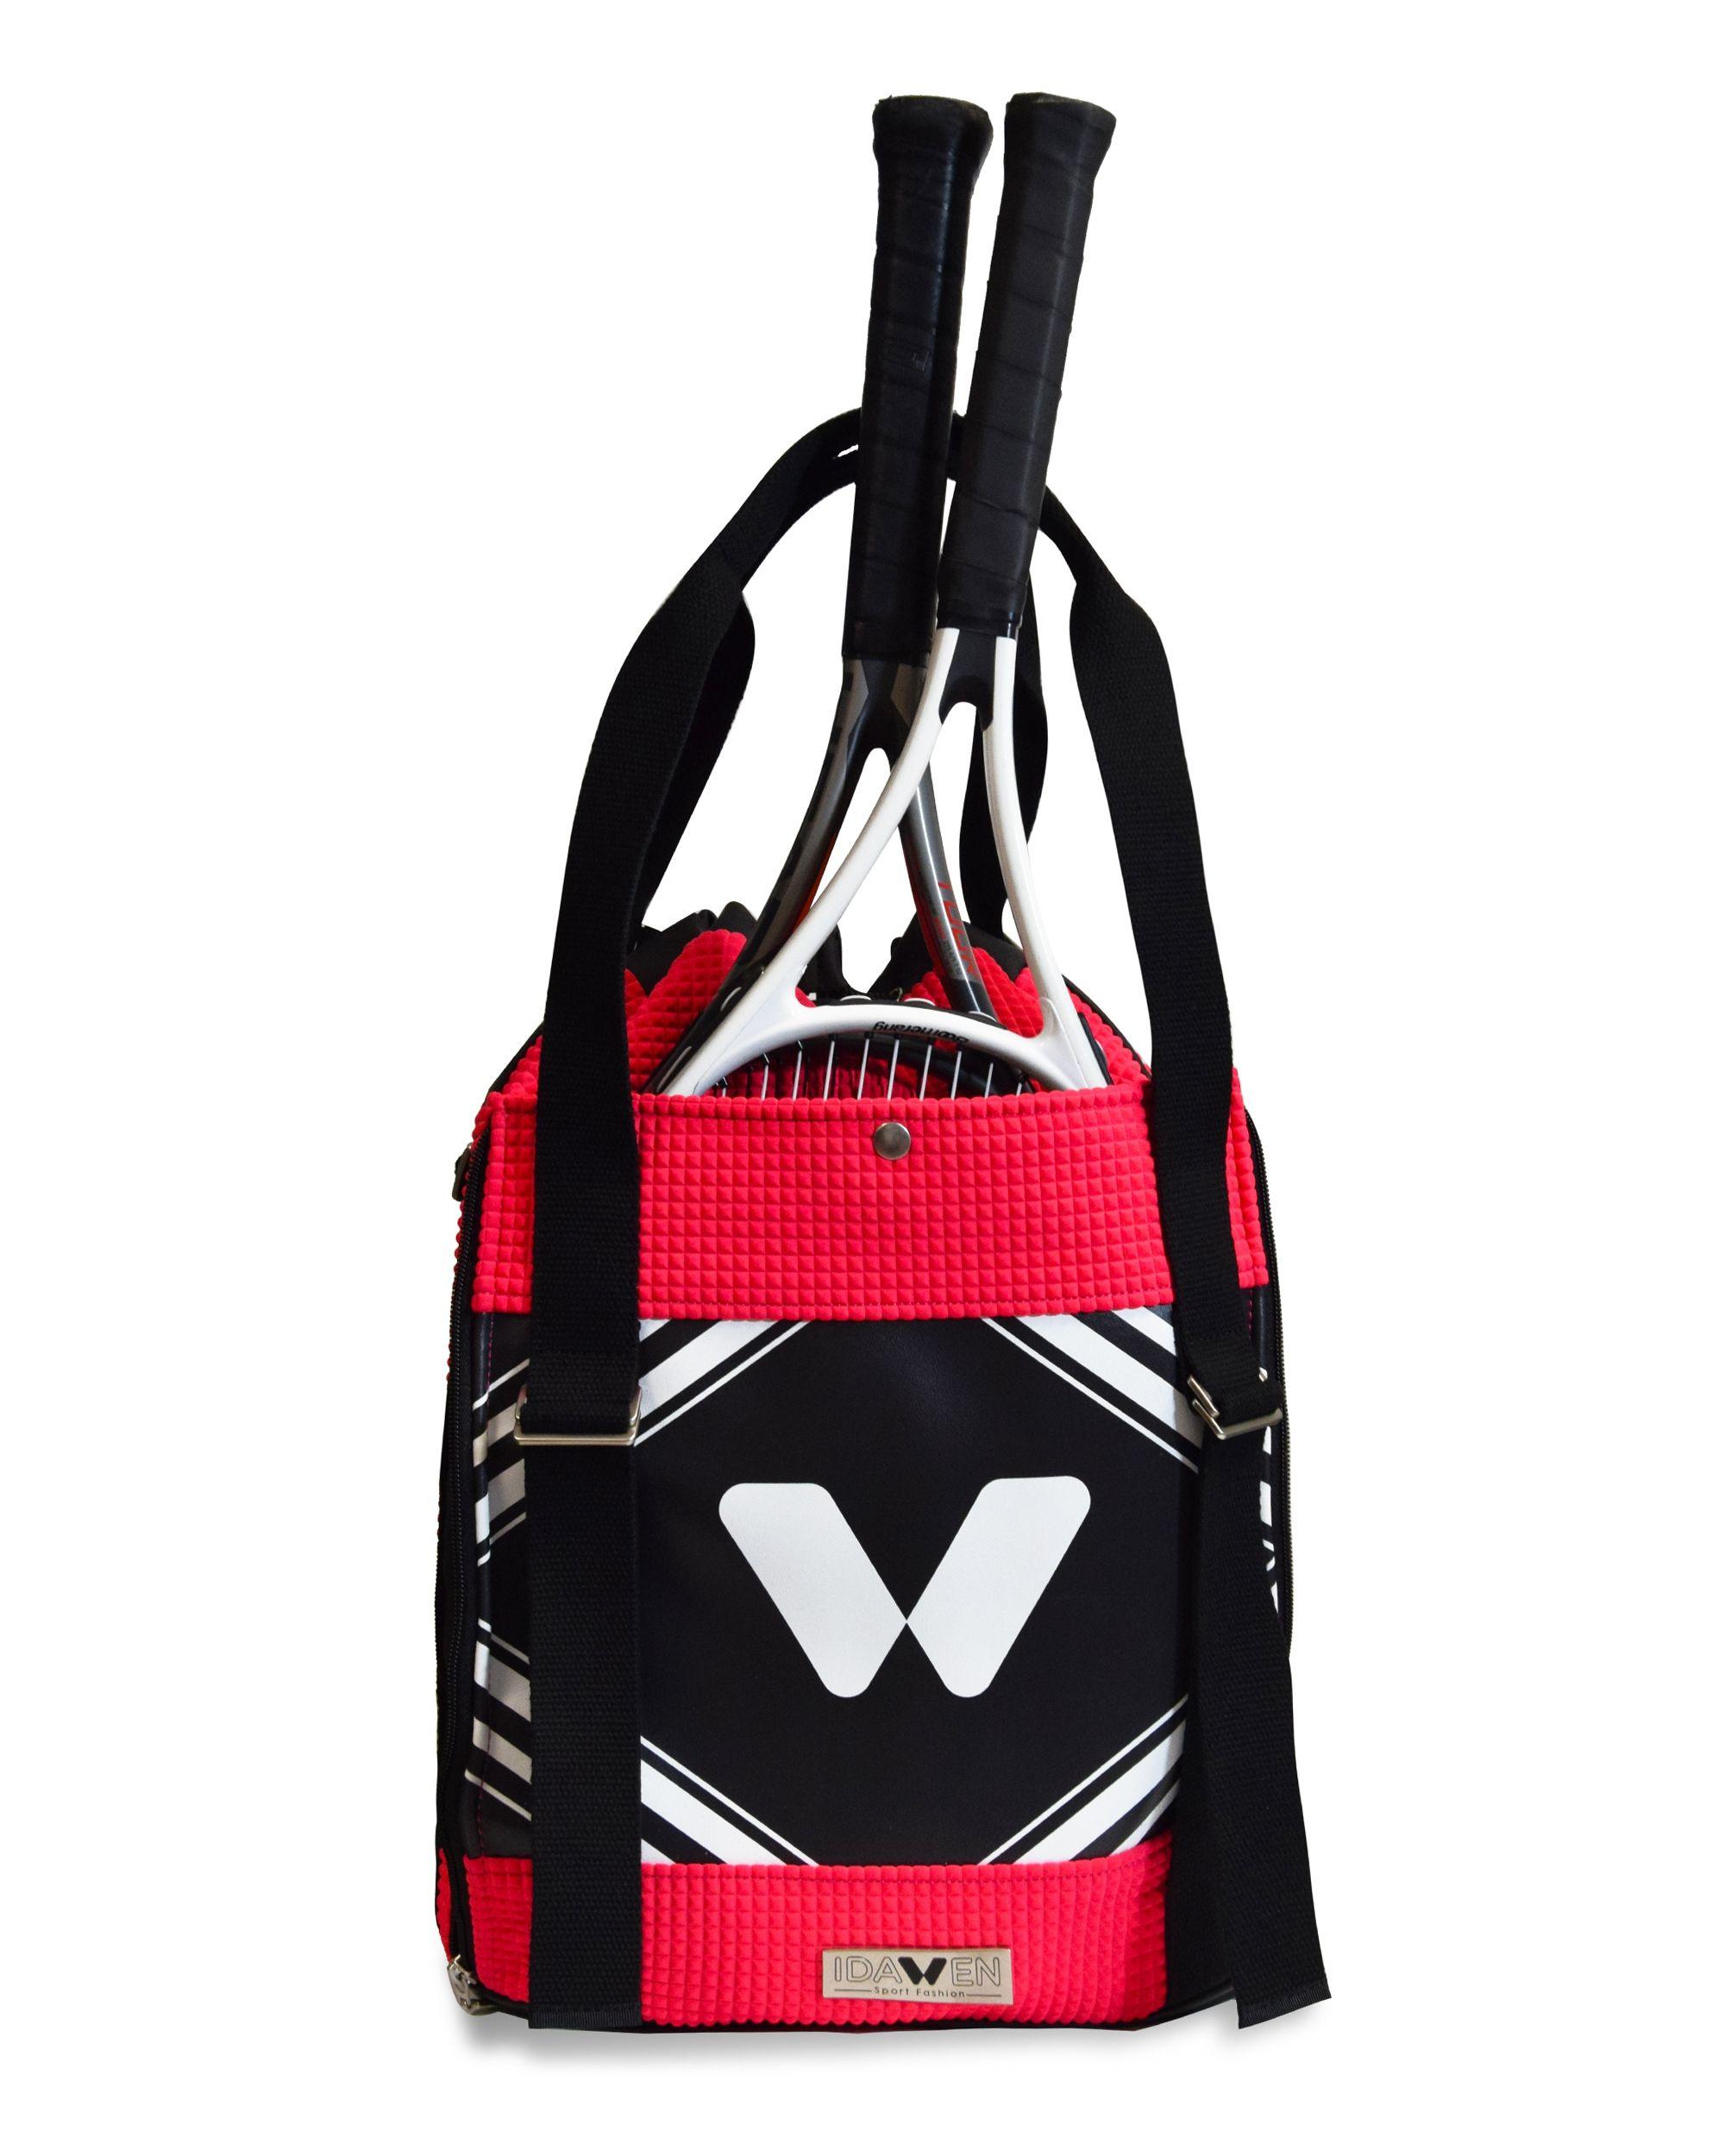 2abeb5e6 Mochila de tenis mujer idawen rosa | Tennis Bags | Tennis bags ...